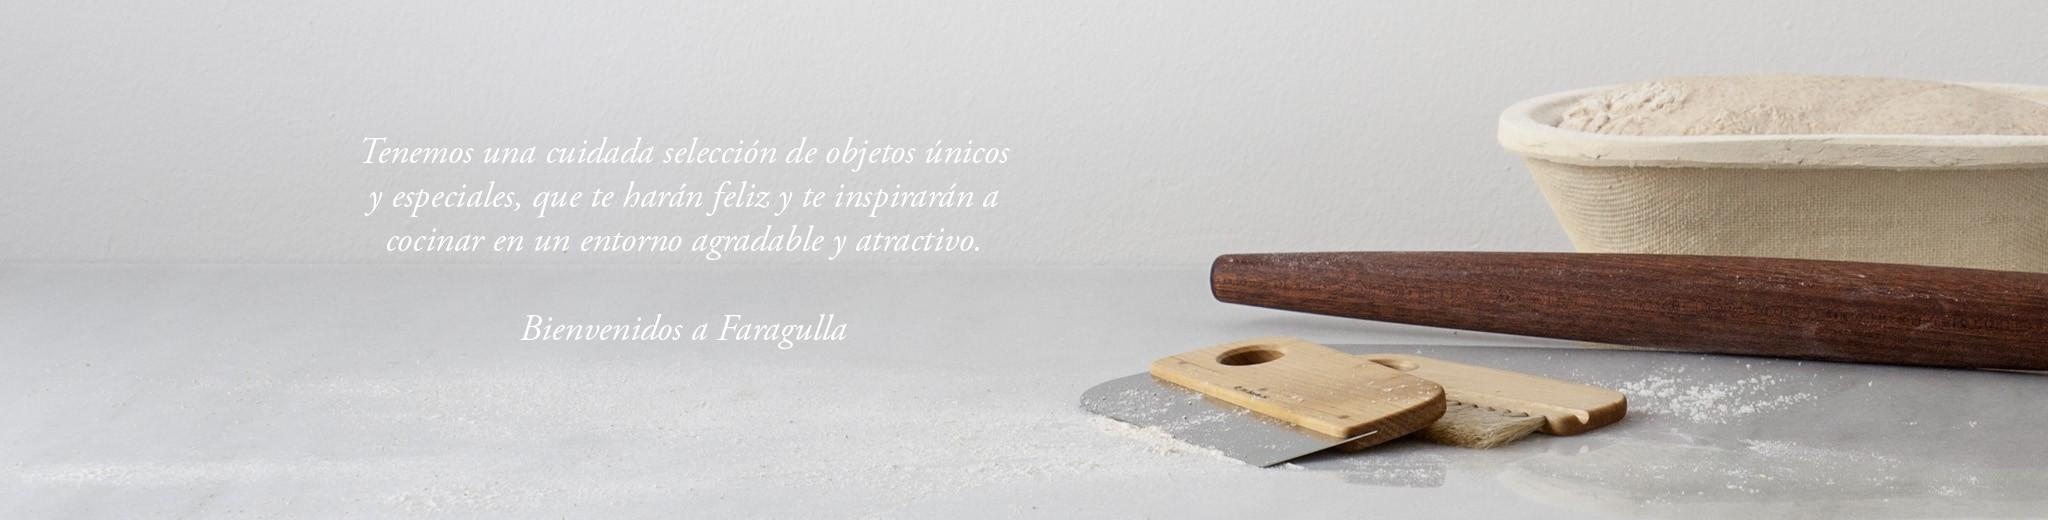 Bienvenidos a Faragulla